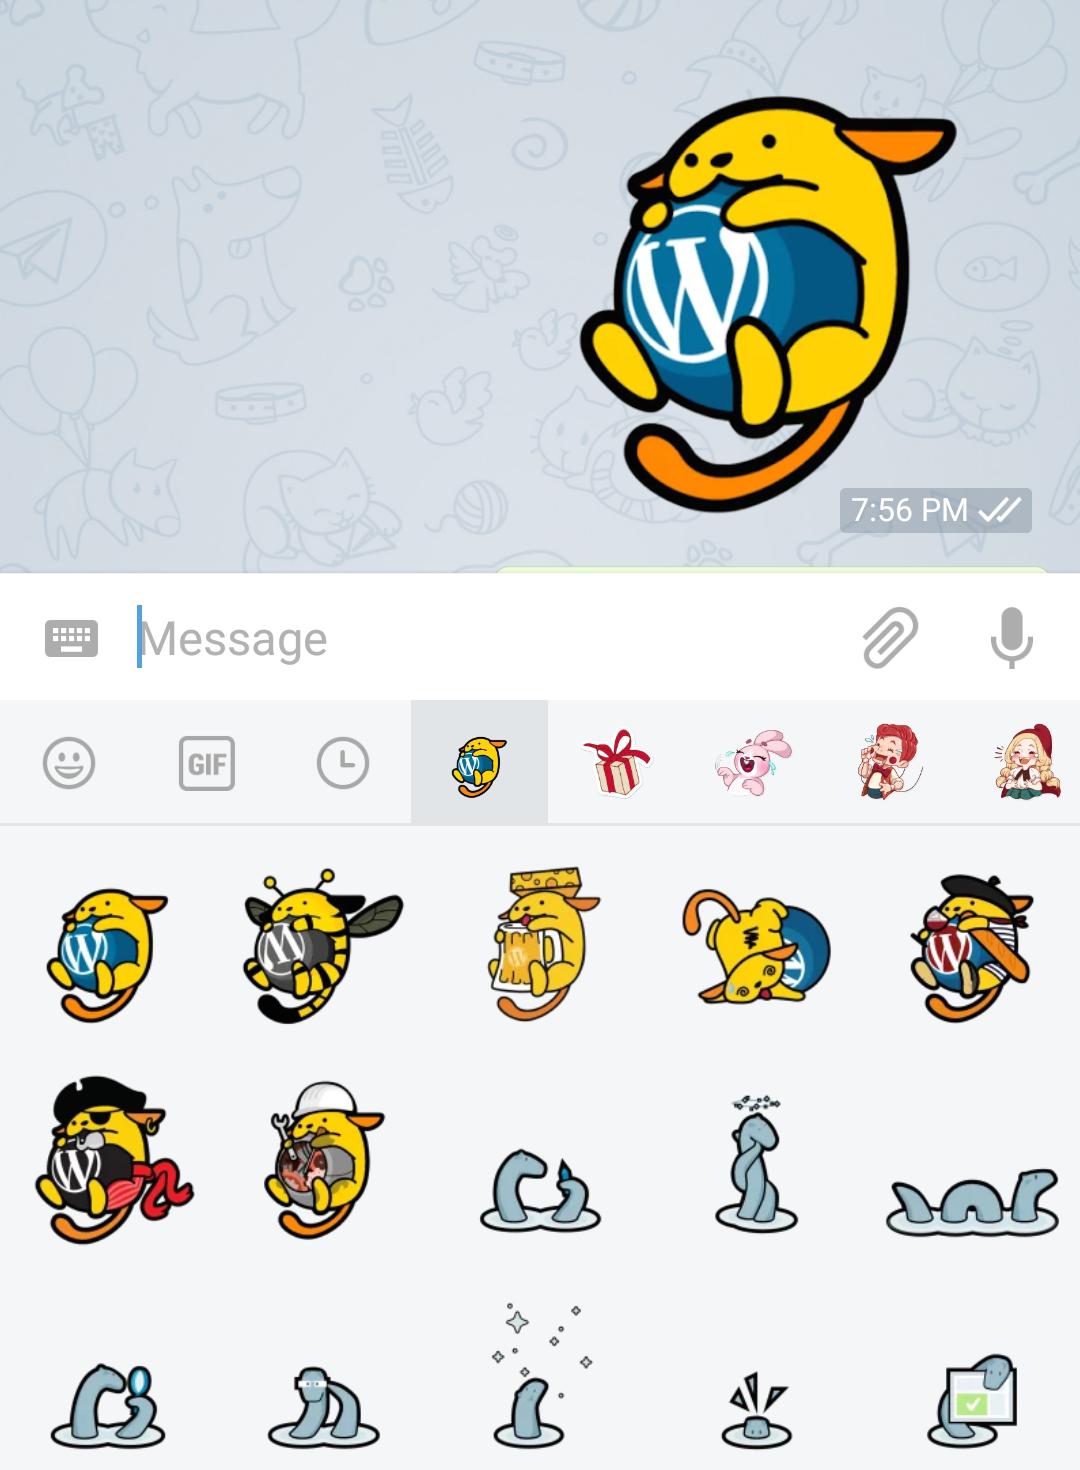 stickers-telegram